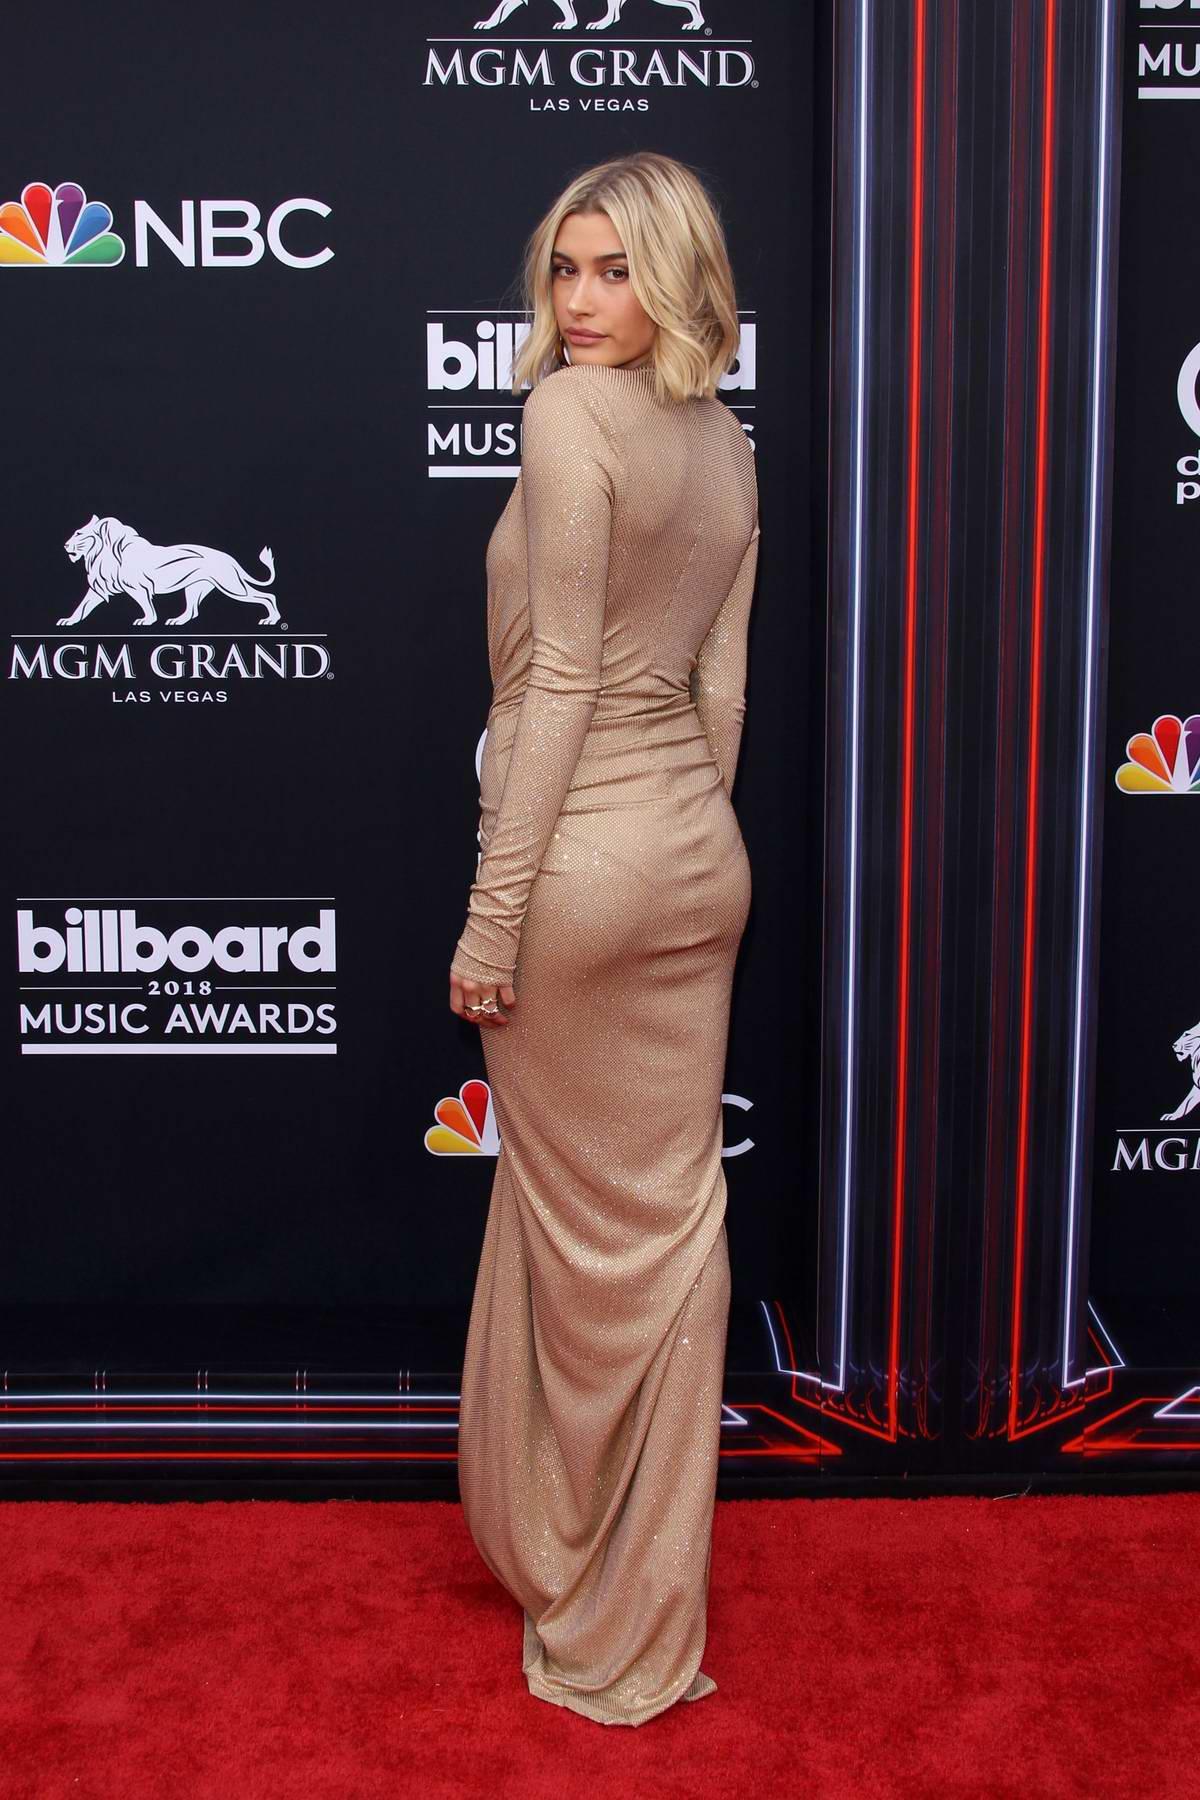 Hailey Baldwin attends the 2018 Billboard Music Awards at MGM Grand Garden in Las Vegas, Nevada